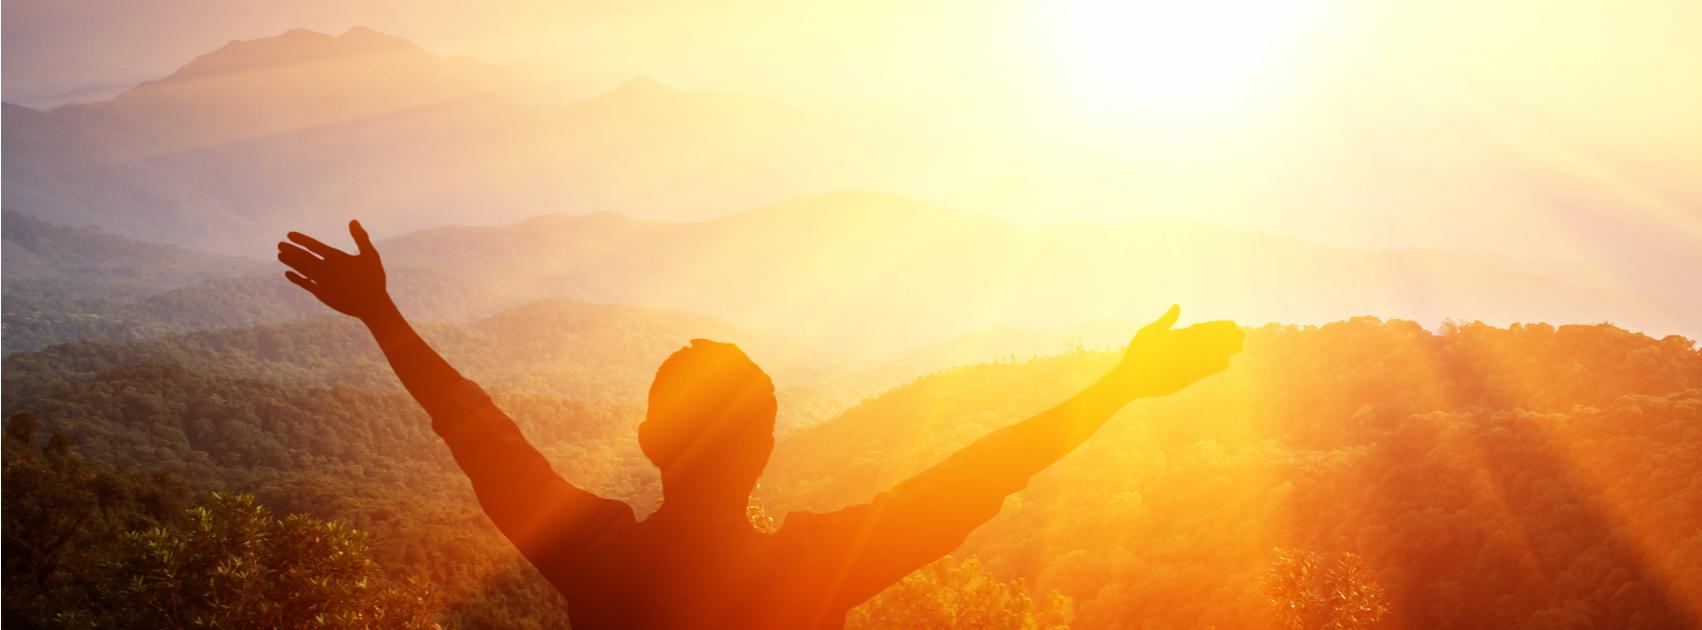 benevolent spirit guide encounters